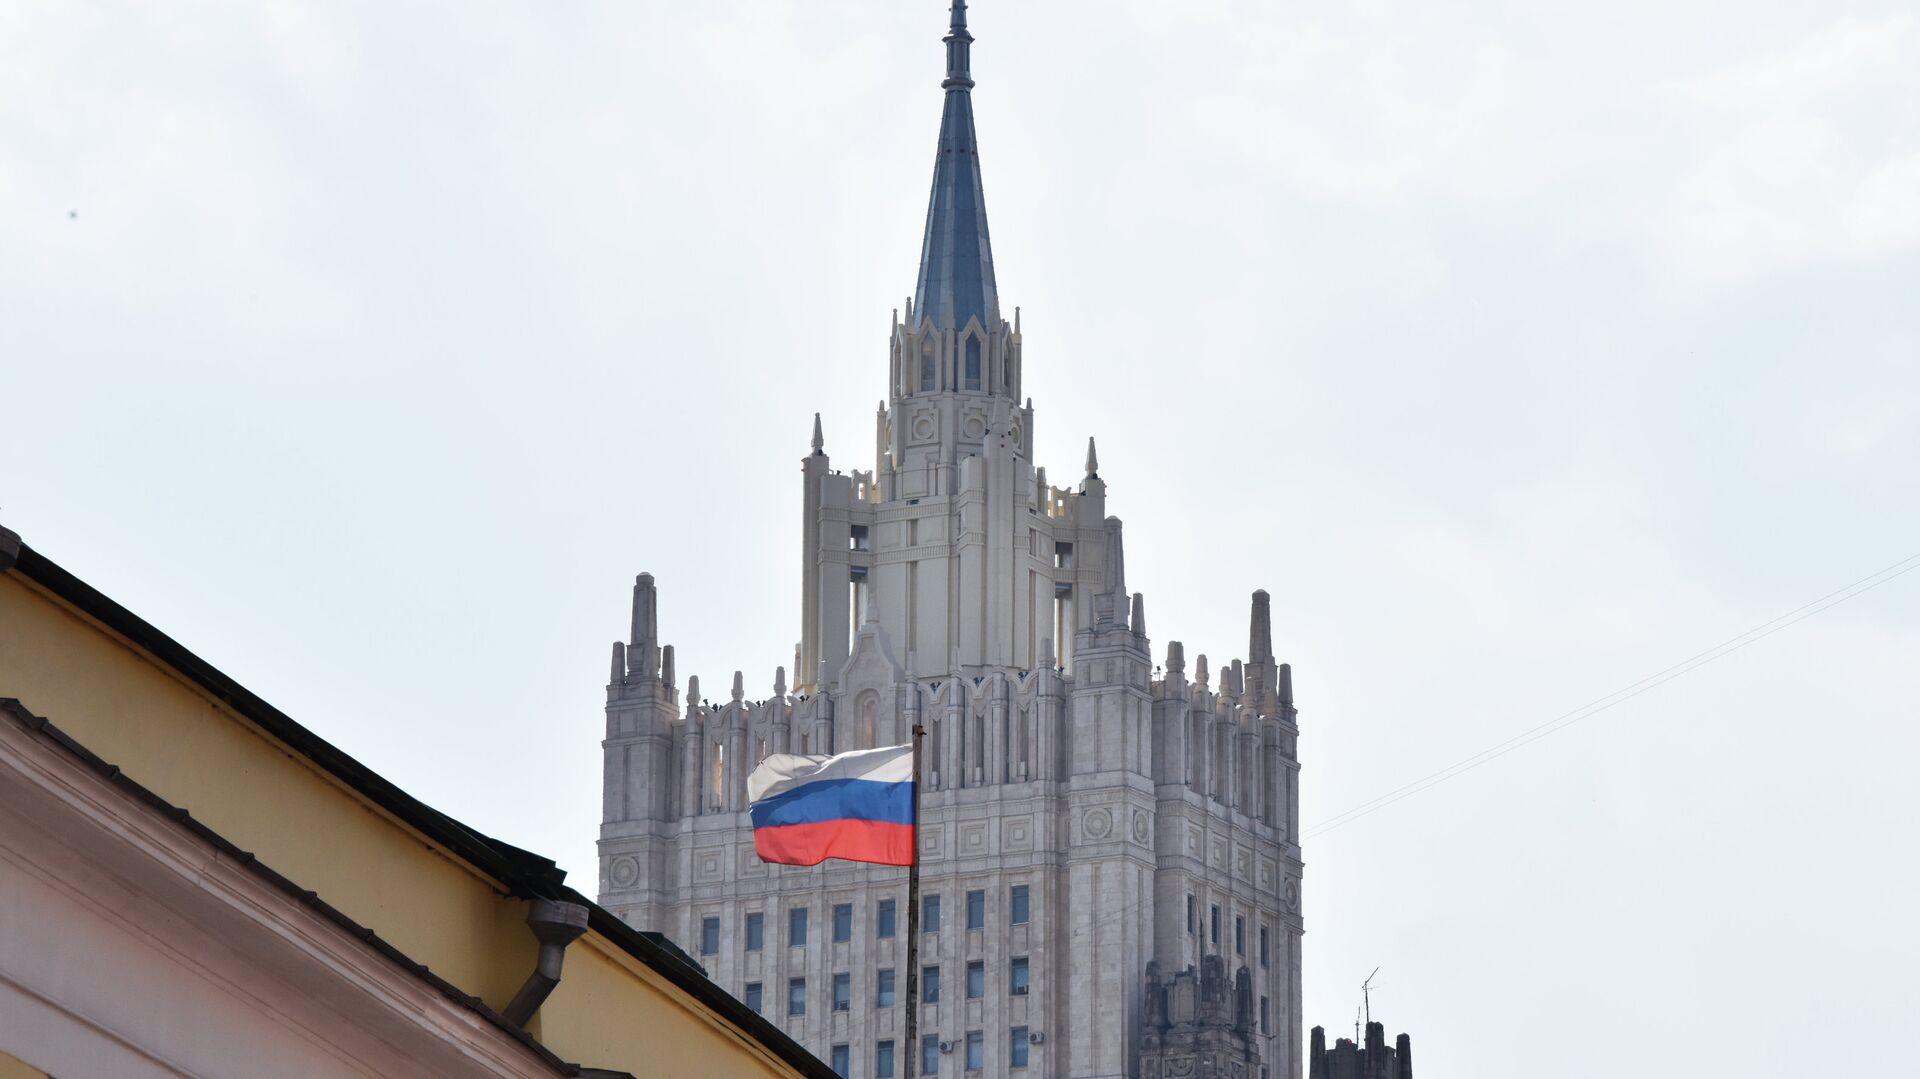 El Ministerio de Asuntos Exteriores ruso en Moscú - Sputnik Mundo, 1920, 10.10.2021